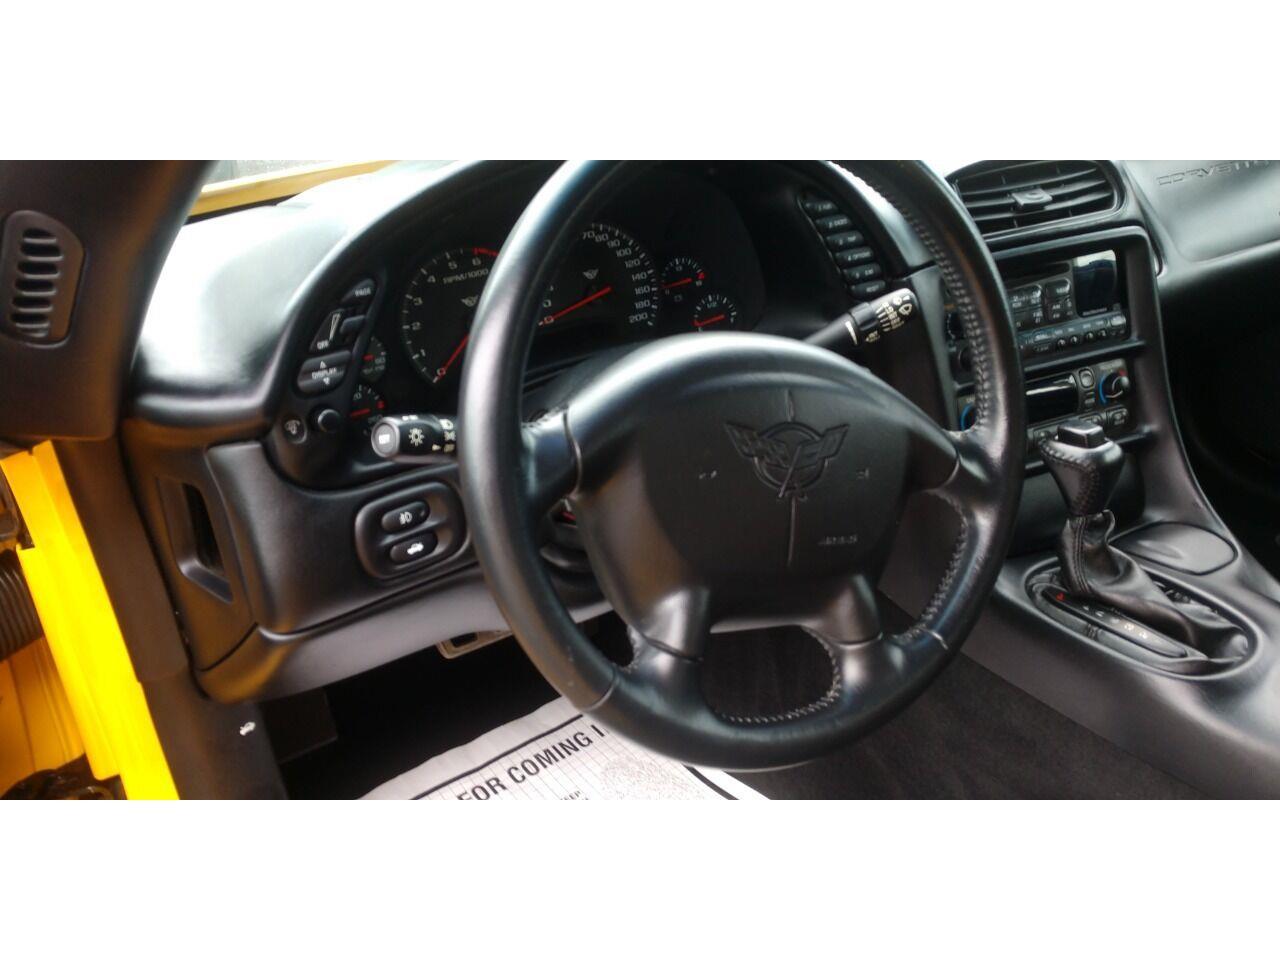 2004 Chevrolet Corvette (CC-1367365) for sale in Saint Charles, Missouri